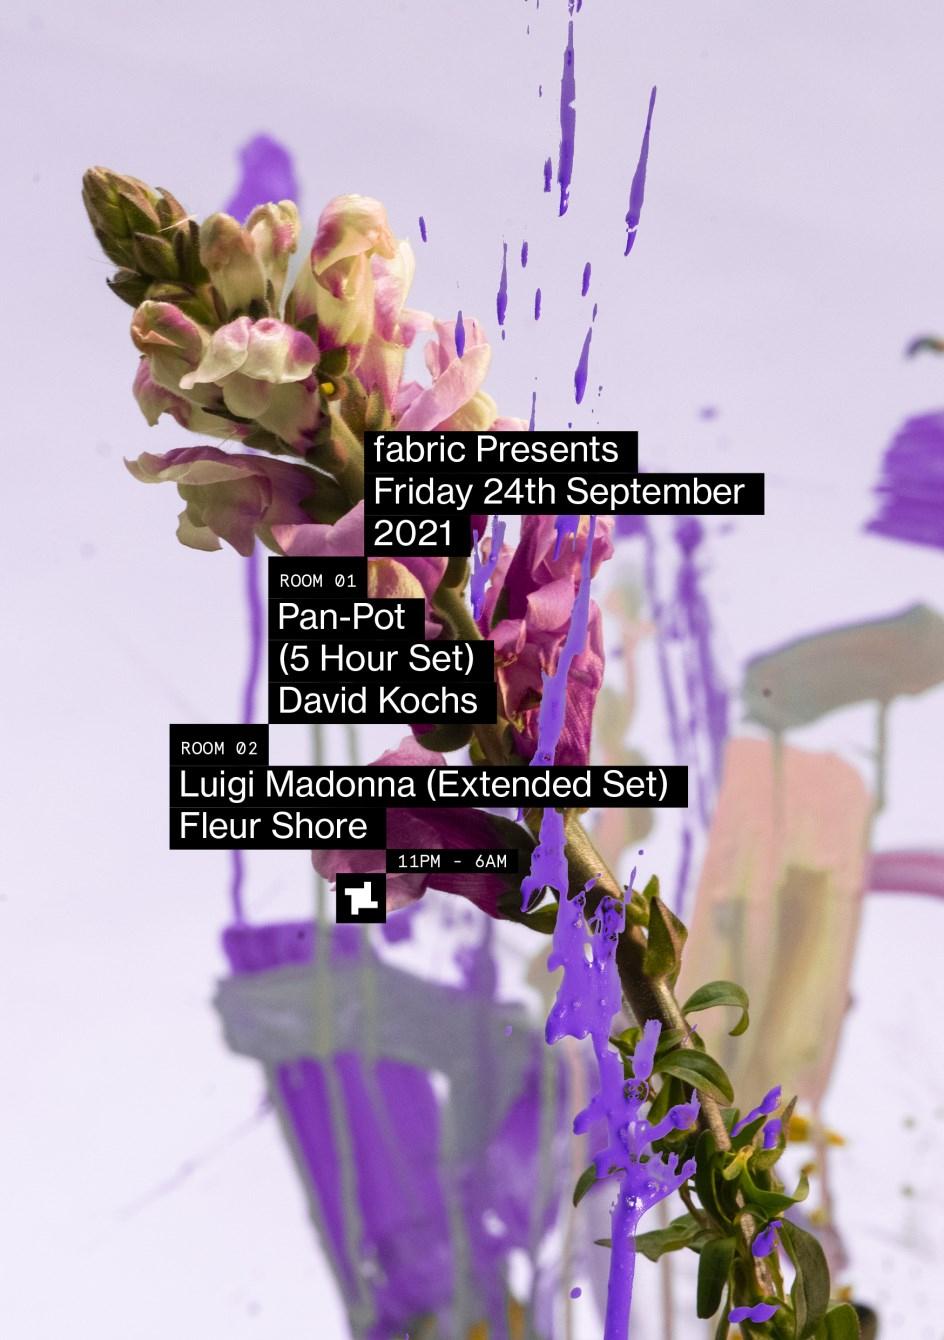 fabric presents: Pan-Pot (5 hours), Luigi Madonna, David Kochs, Fleur Shore - Flyer front